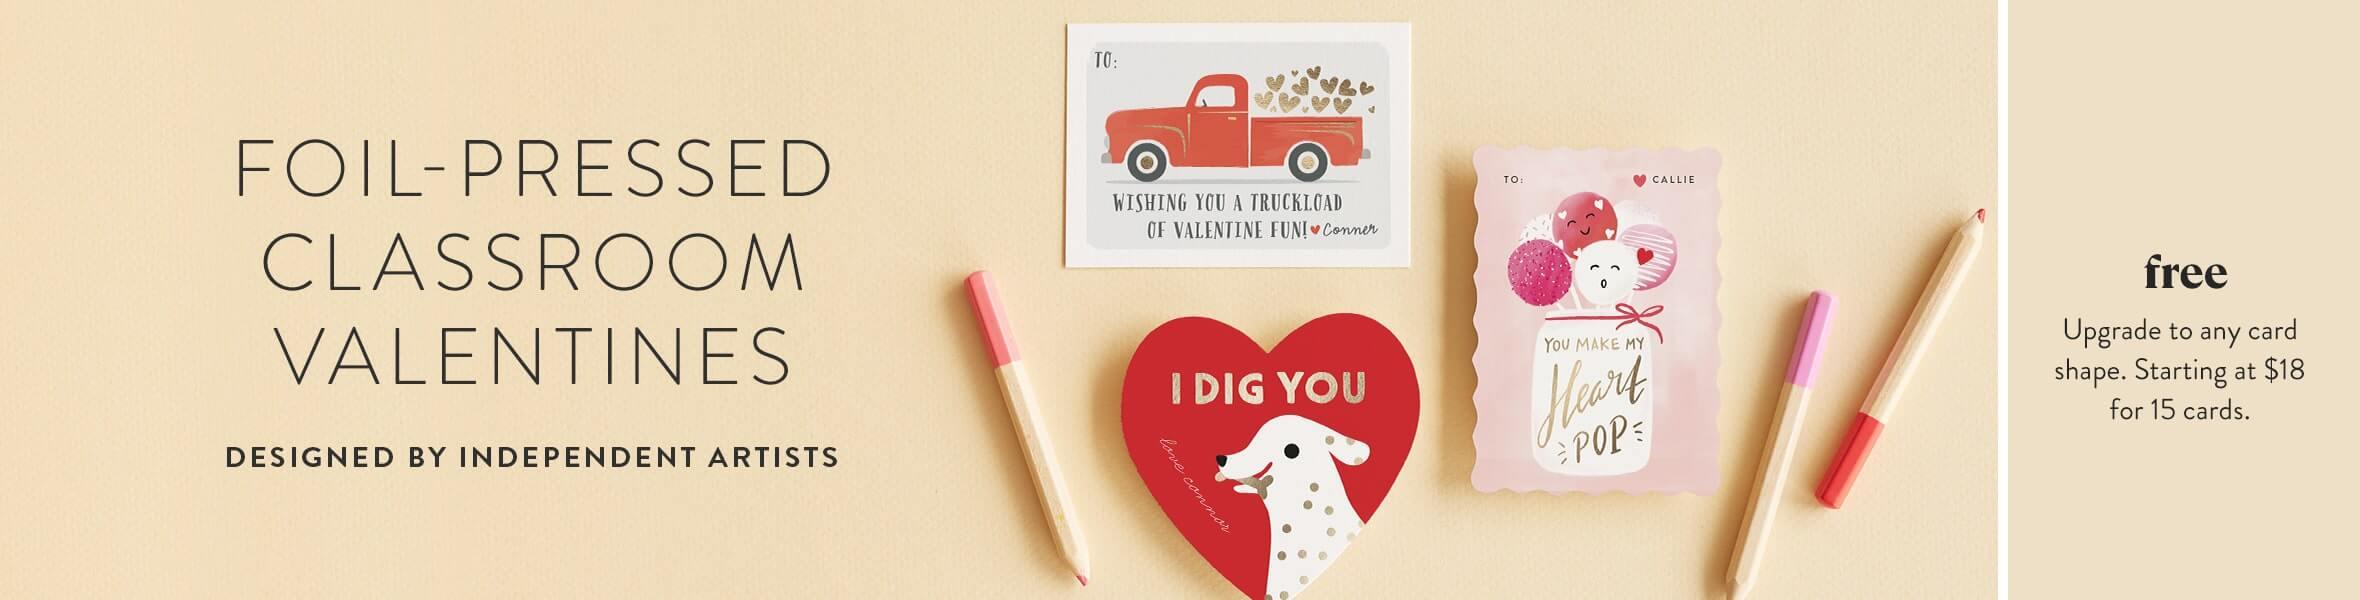 Foil-pressed Classroom Valentines